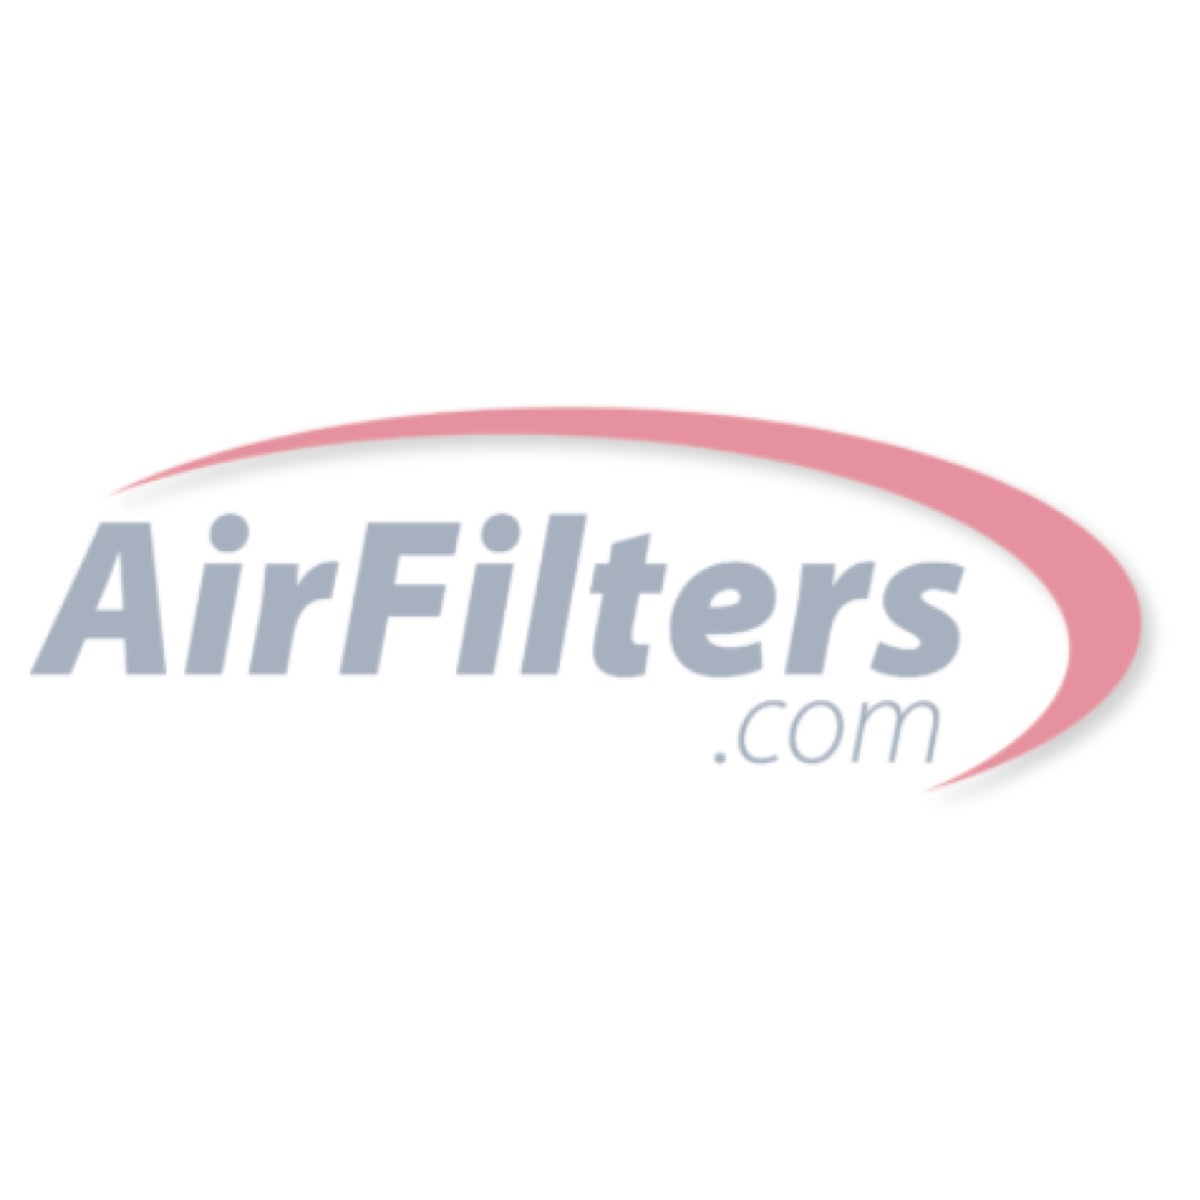 20x25x4.5 BDP® EZ Flex Filters by Accumulair®